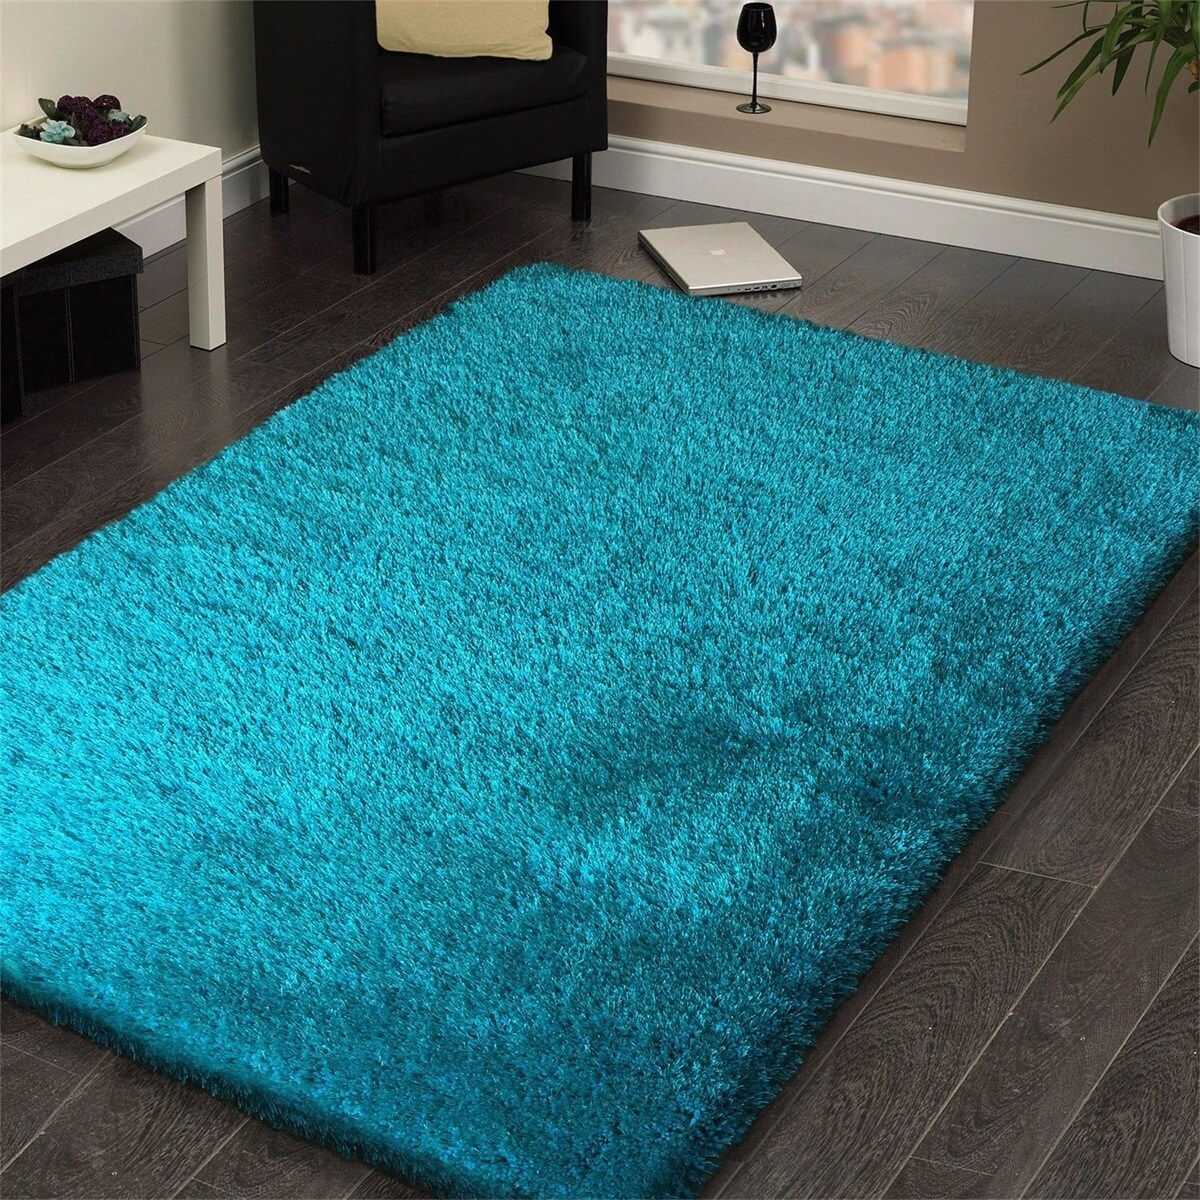 Handmade Turquoise Shag Area Rug (5' x 7') (Turquoise), B...